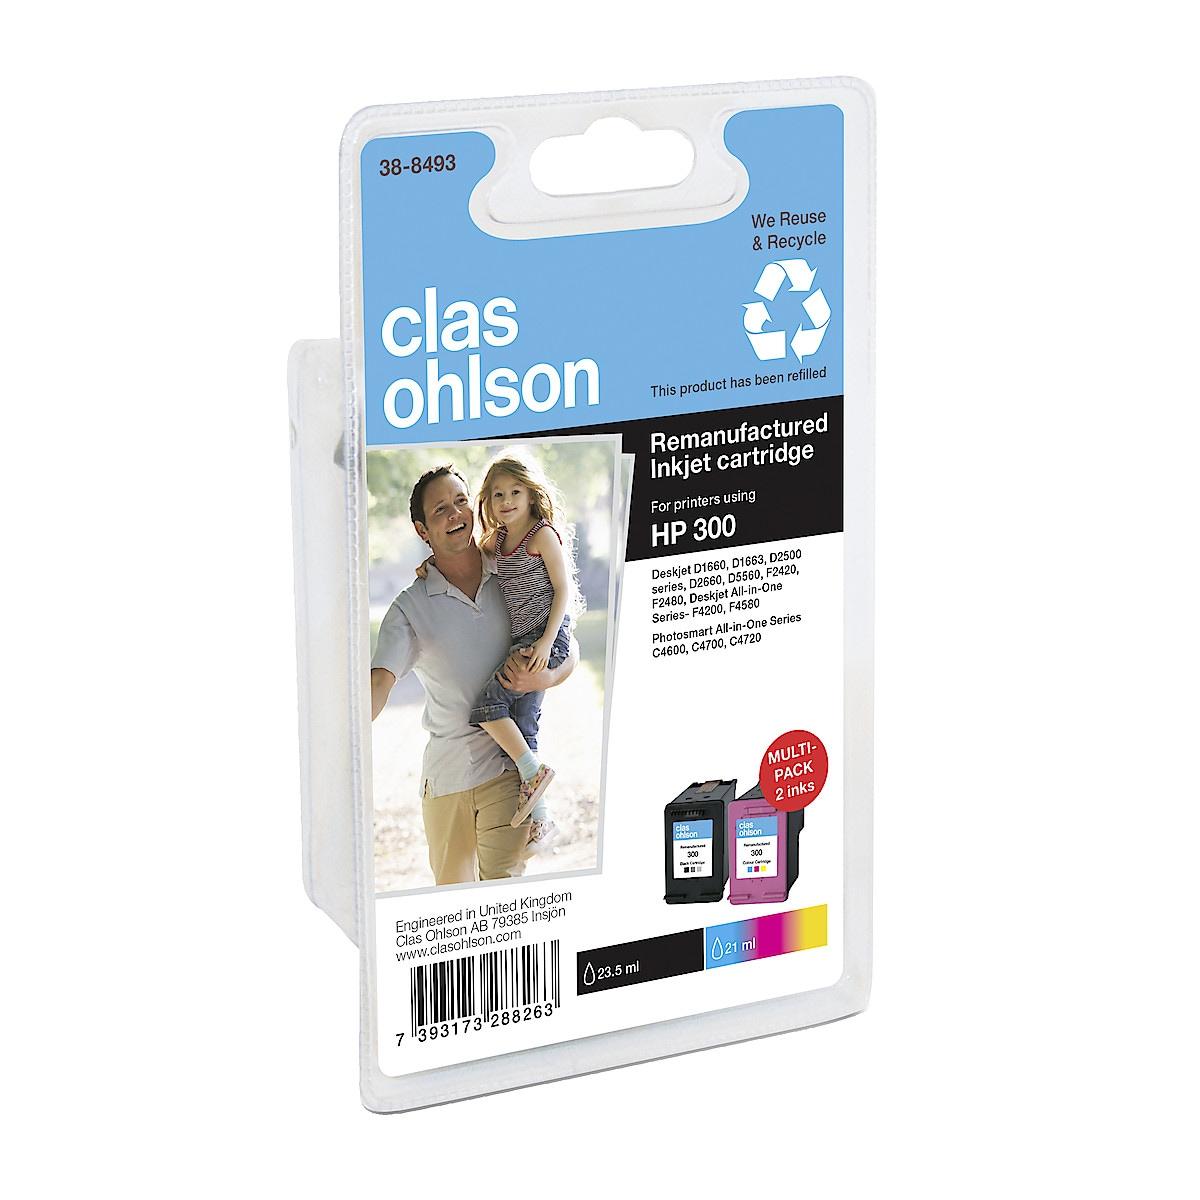 Mustepatruuna HP 300 XL Clas Ohlson